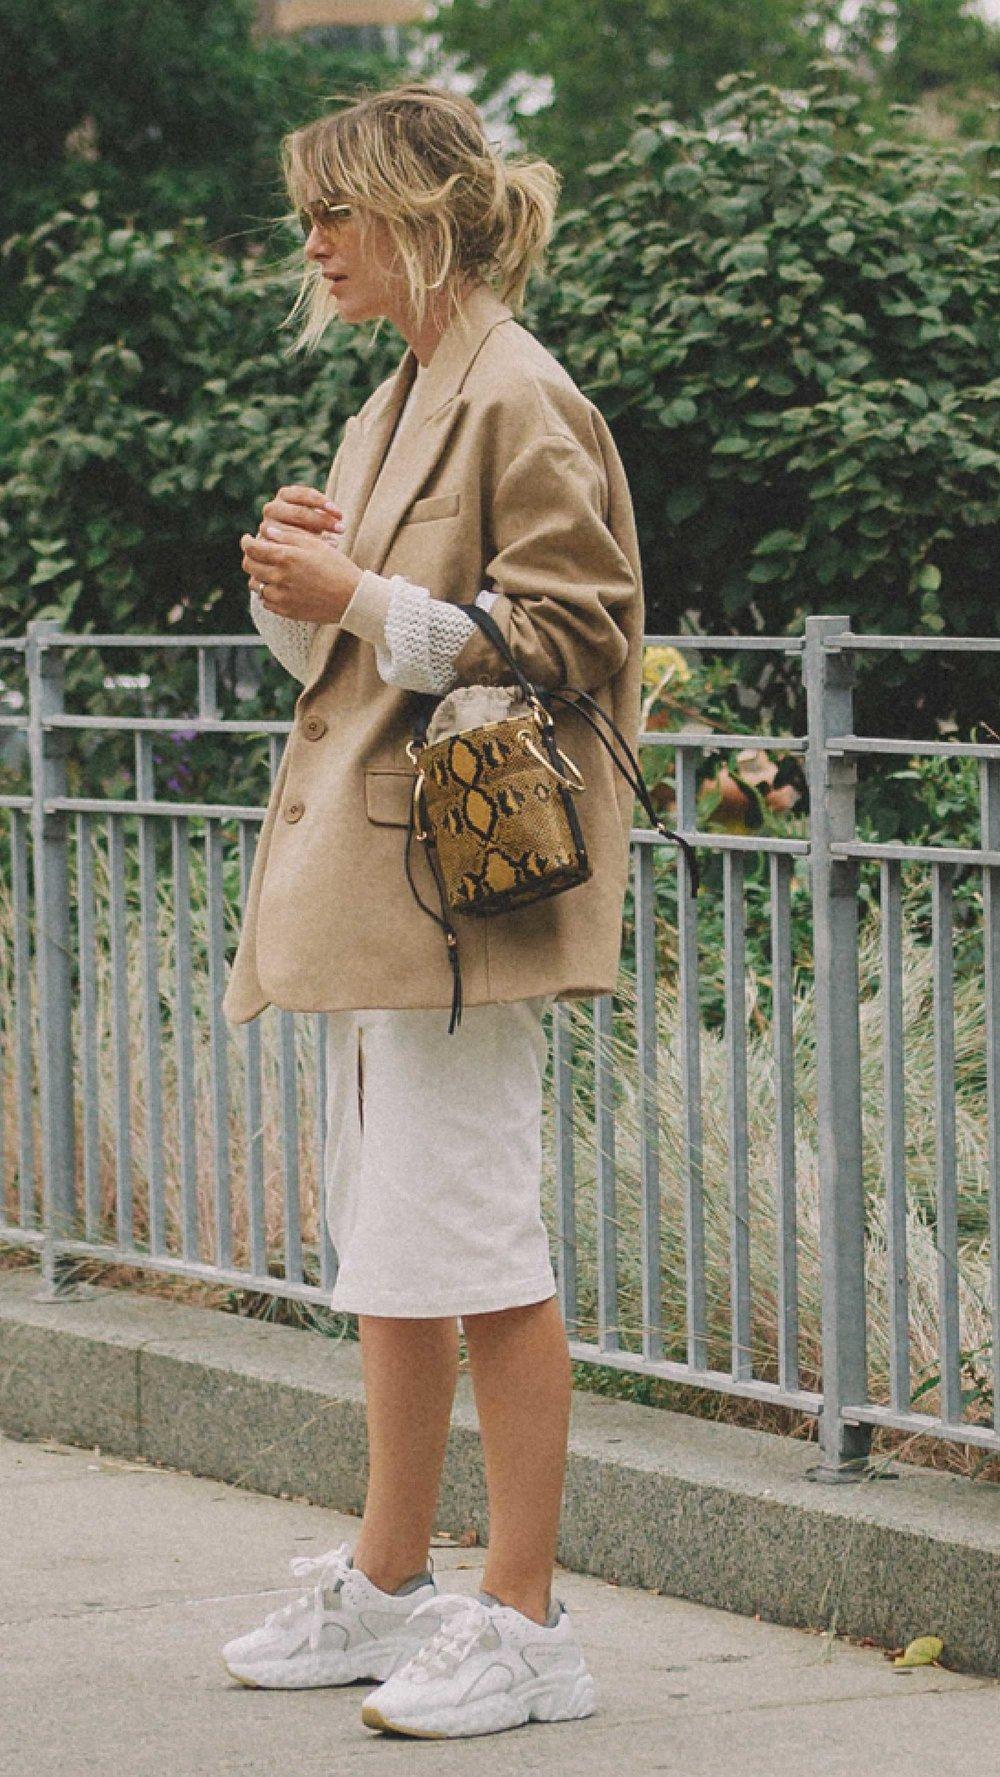 12 Best Chloe bags of Fashion Week -  CHLOe Roy mini leather bucket bag and Chloe Small Tess Leather Shoulder Bag13.jpg